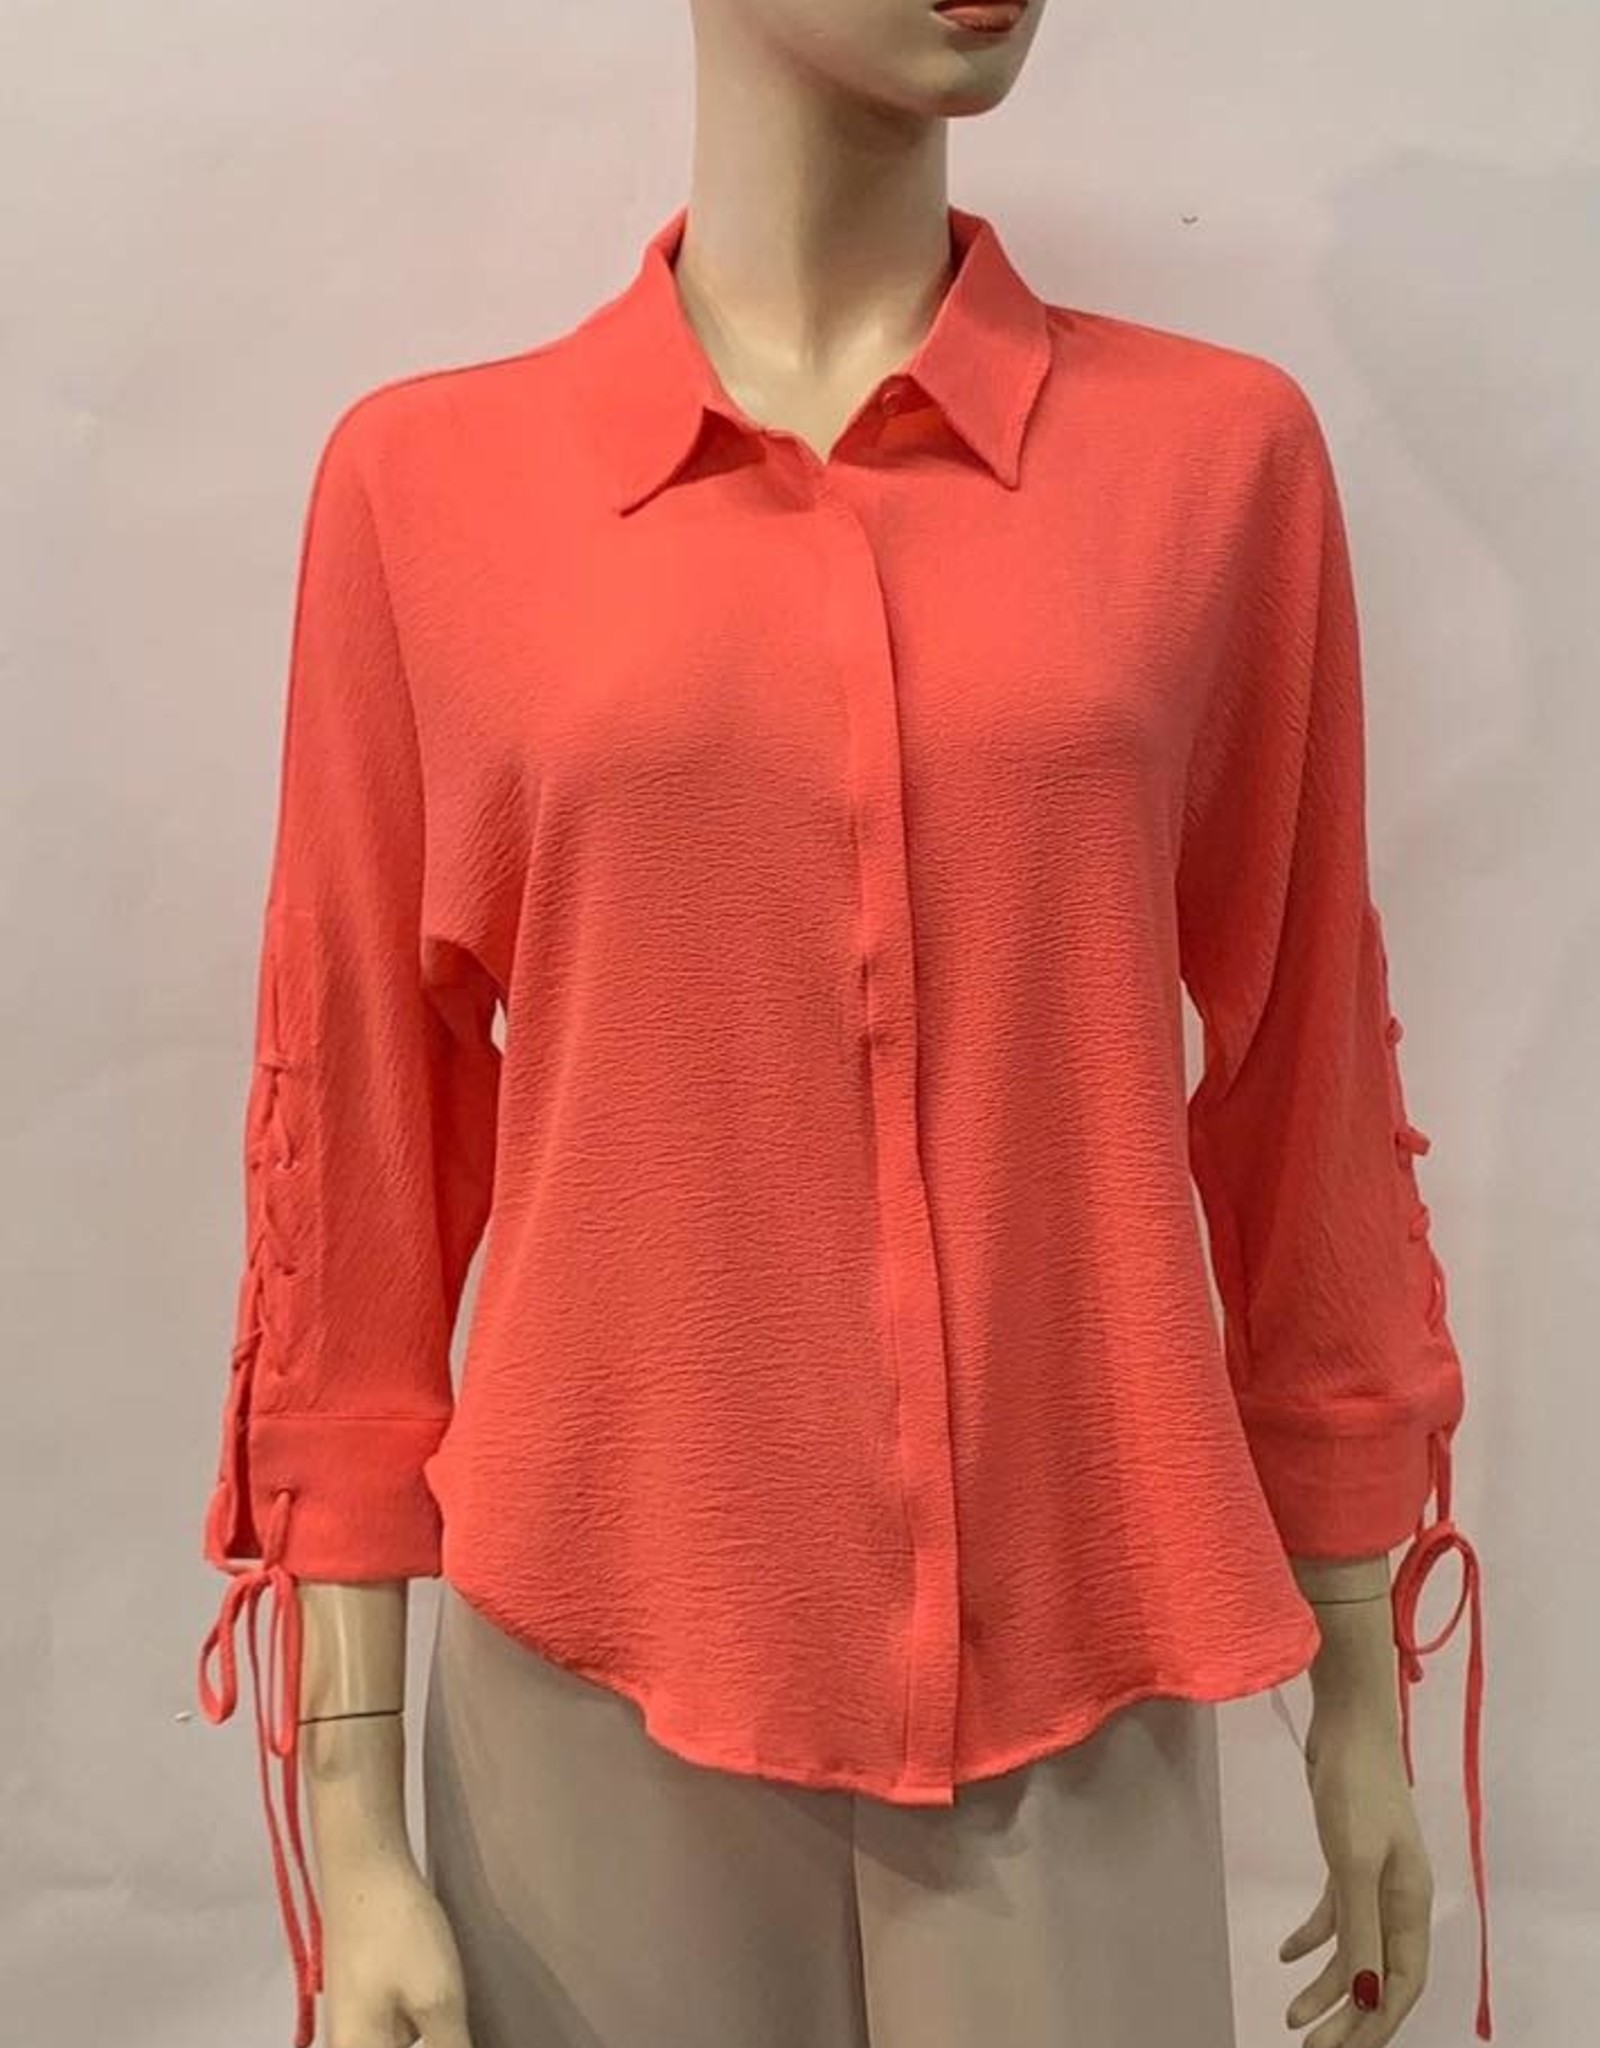 - Coral Button Down Top w/Tie Detail on Wrist